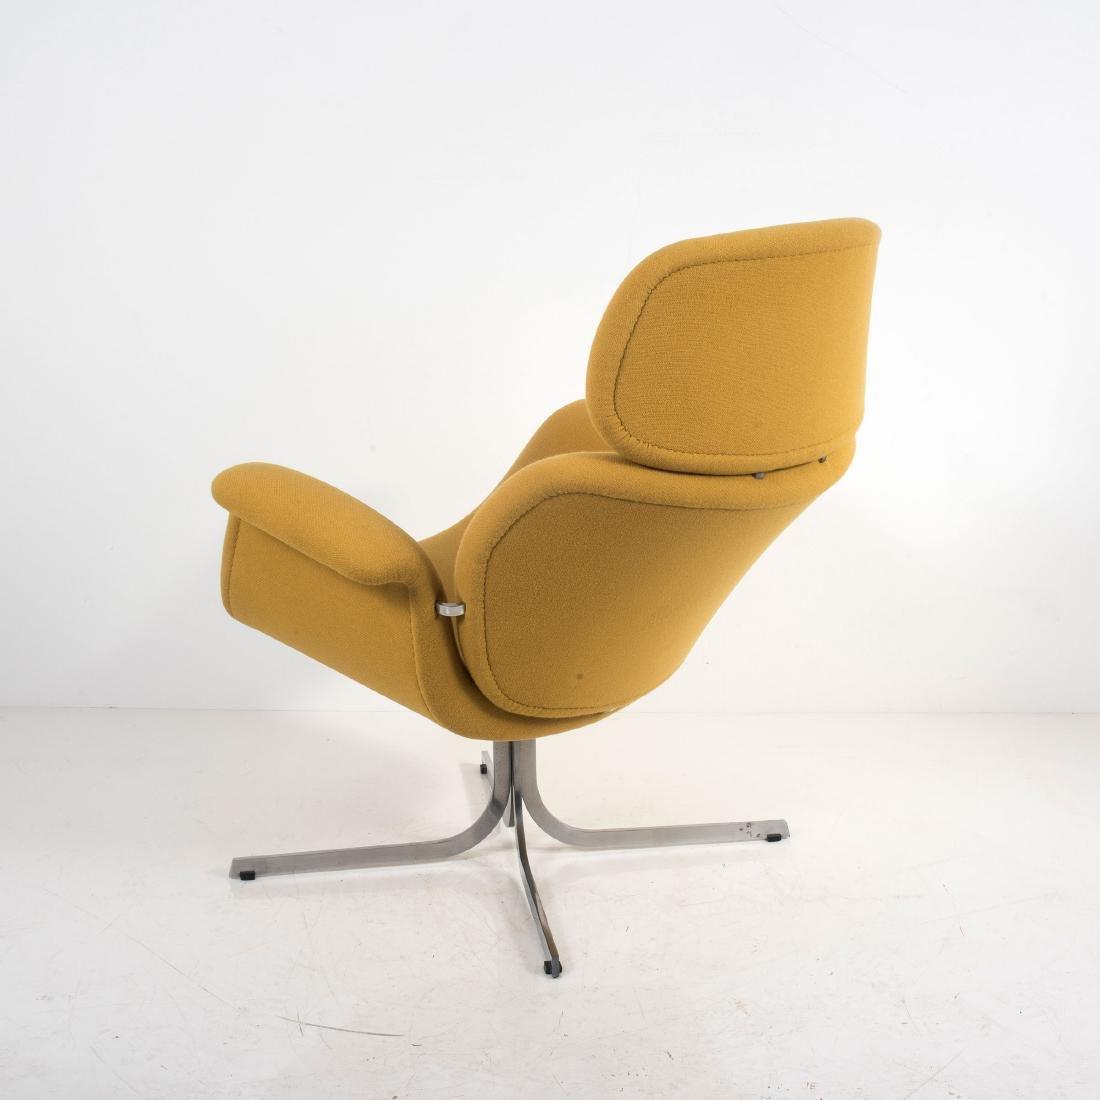 'F 545' - 'Big Tulip' easy chair, 1959 - 4